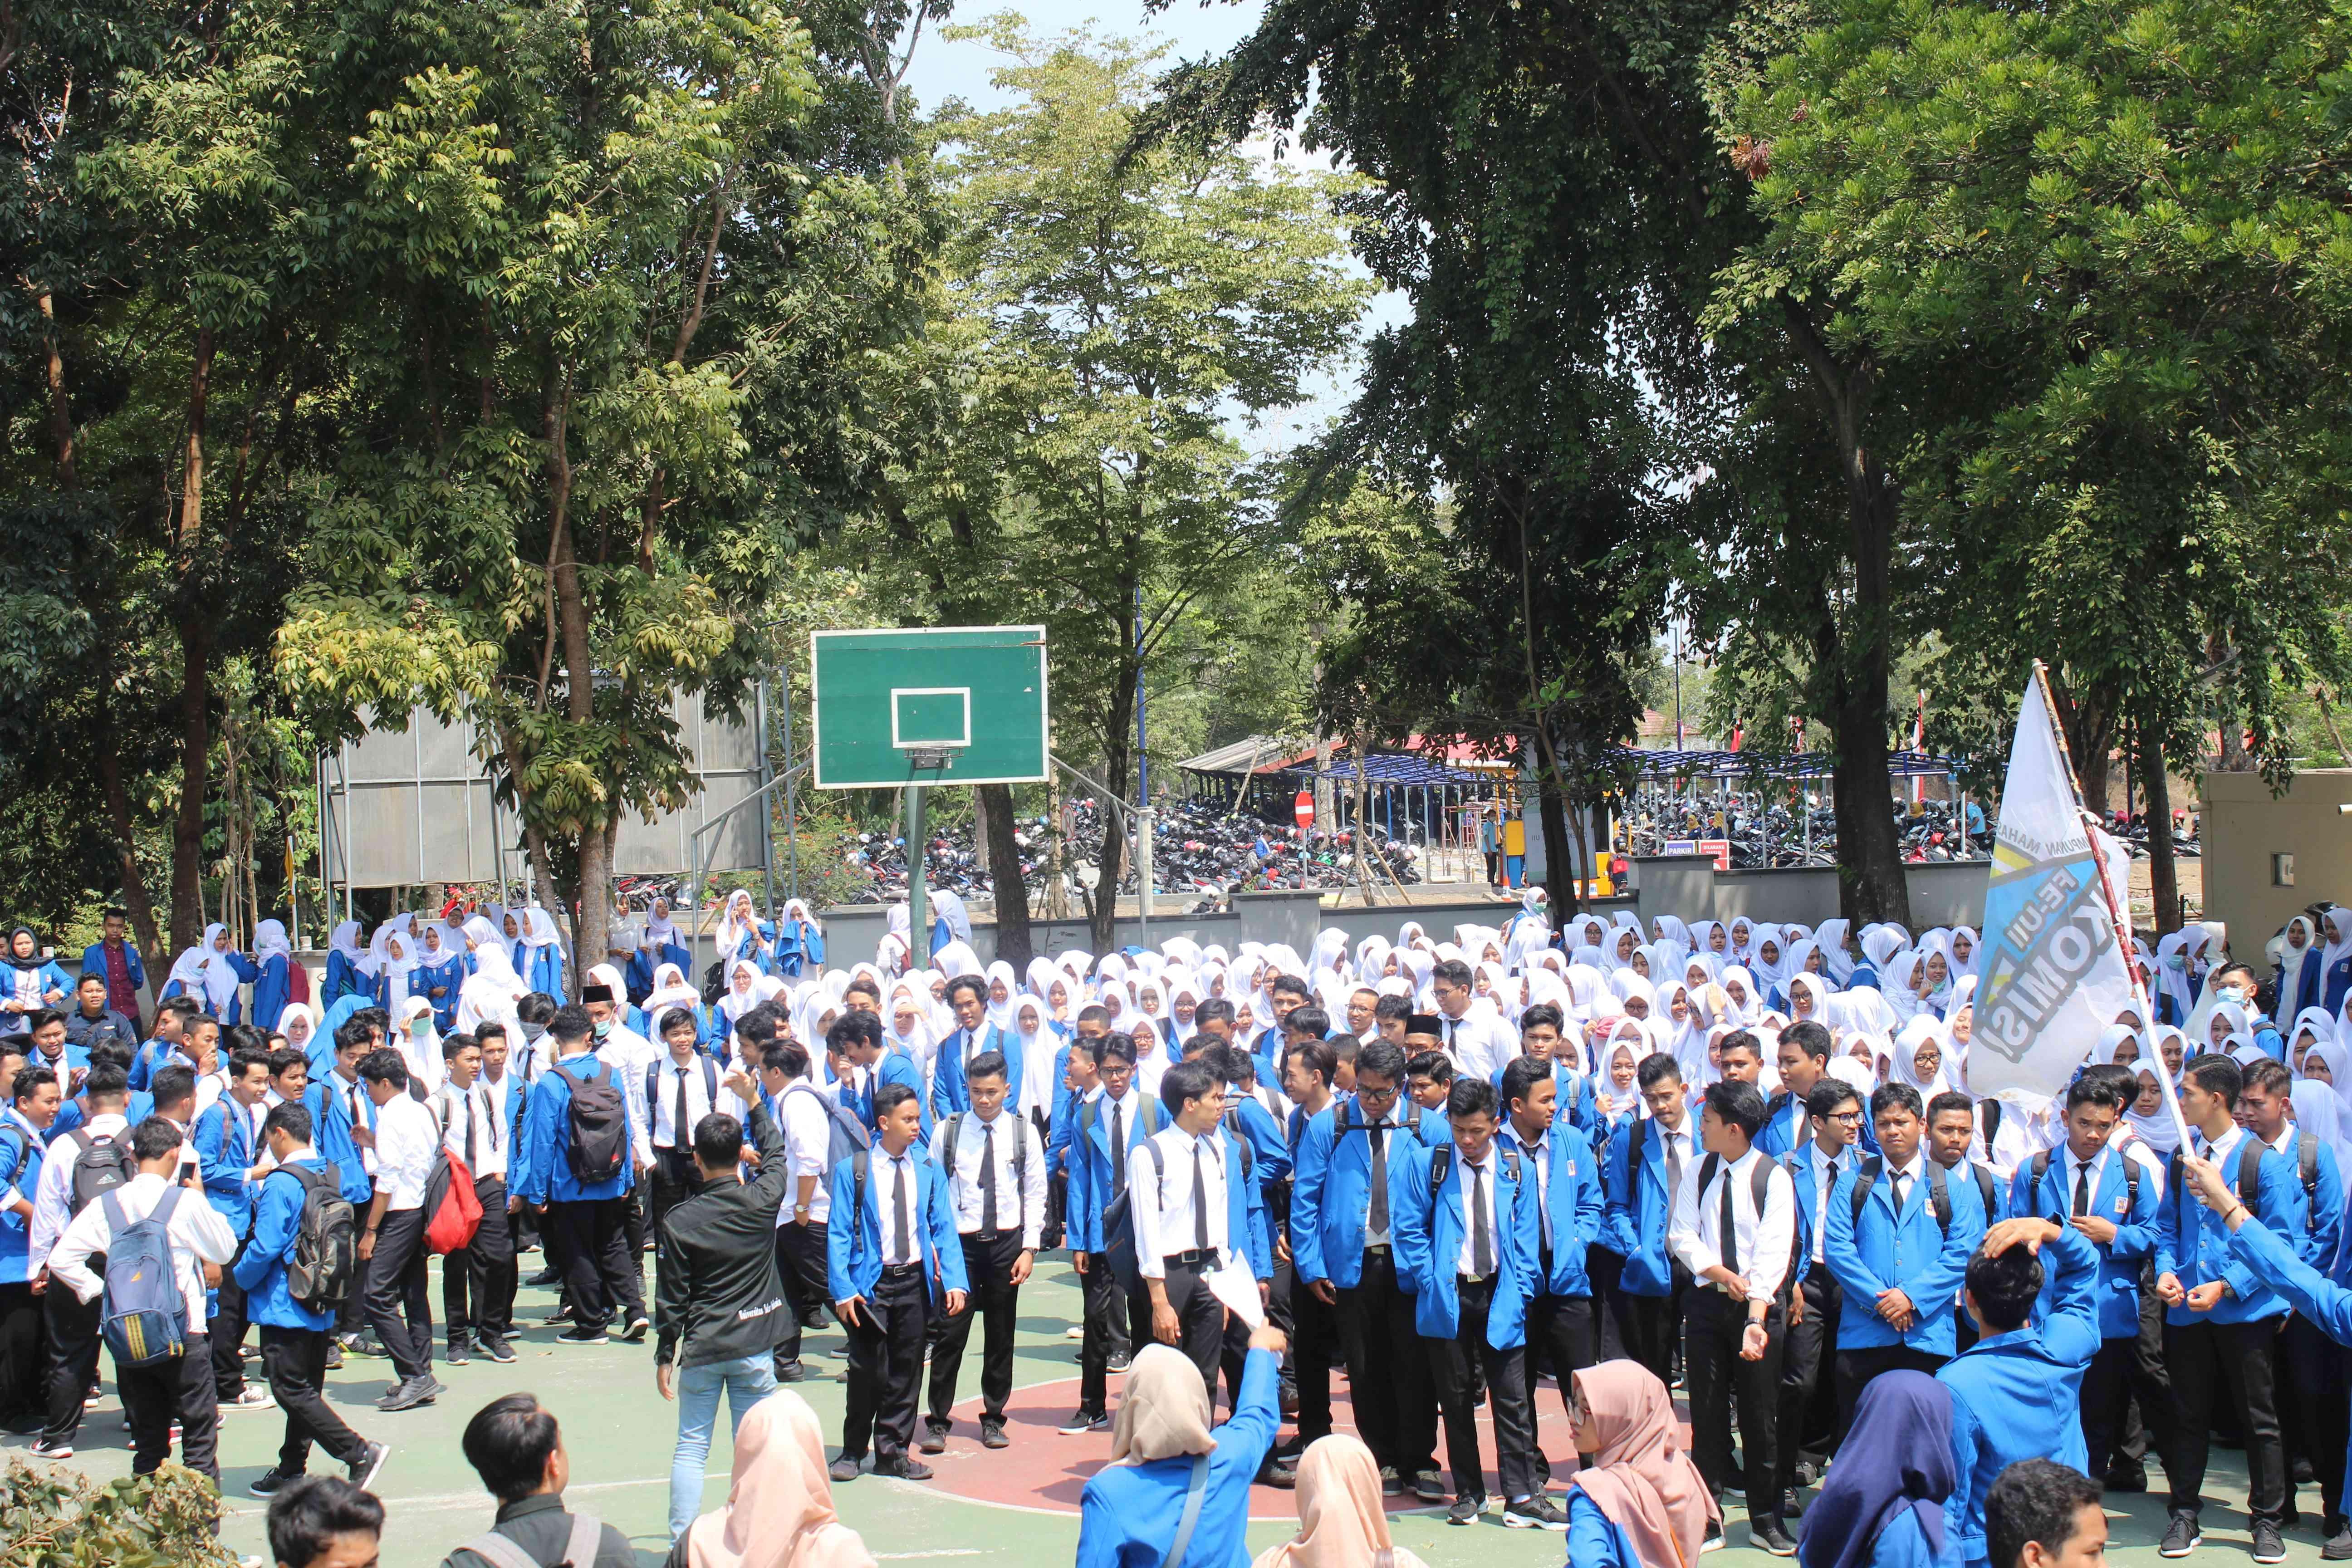 Setelah kuliah perdana, mahasiswa baru Jurusan Akuntasi dikumpulkan untuk berkenalan dengan Himpunan Mahasiswa Jurusan Akuntansi (HMJA) KOMISI FE UII dan berfoto bersama. (Foto : Ghani/Ekonomika)